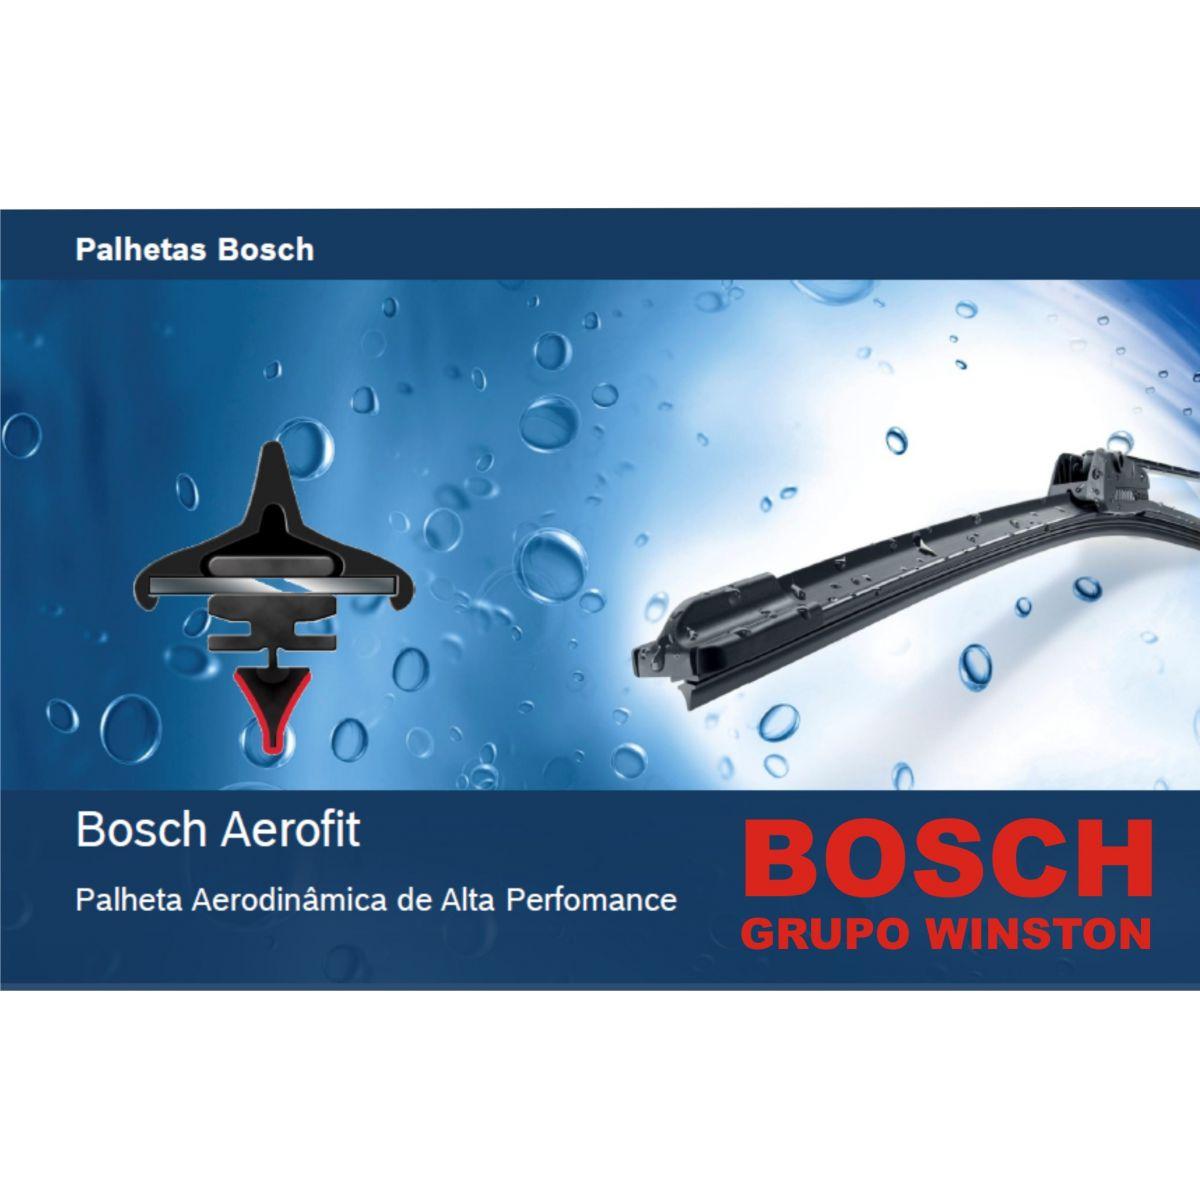 Palheta Bosch Aerofit Limpador de para brisa Bosch Mitsubishi ASX